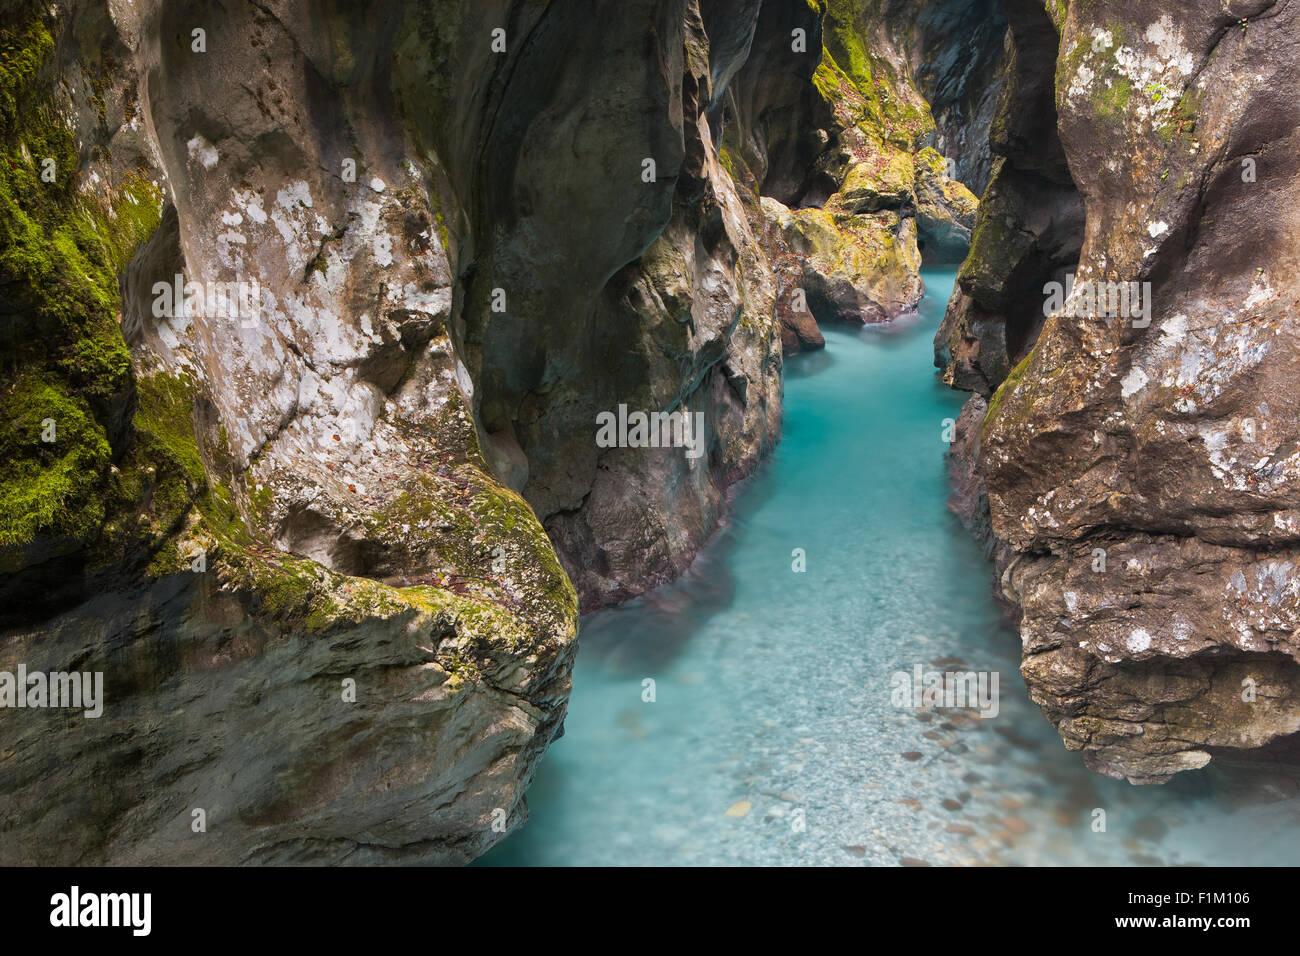 The Tolmin gorges, Triglav National Park, Slovenia Stock Photo